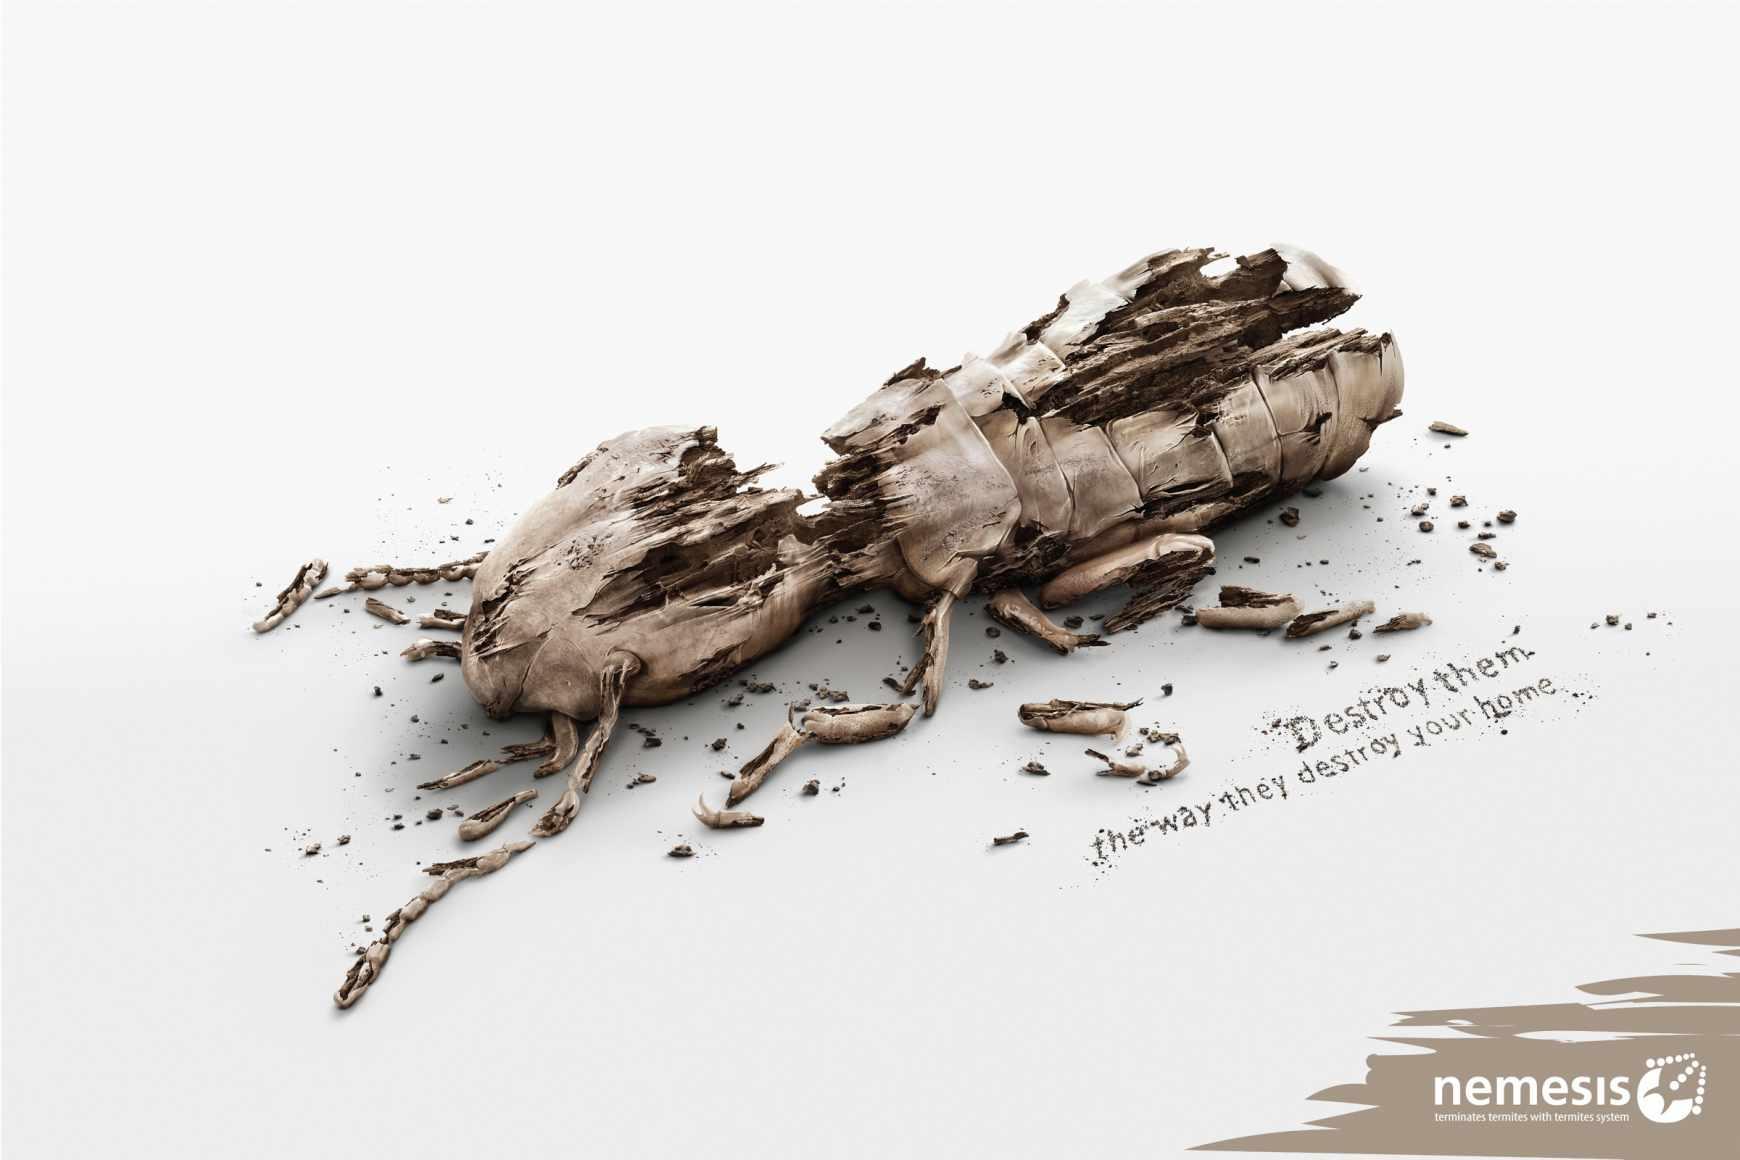 worker_-_nemesis_termites_system_rgb_aotw